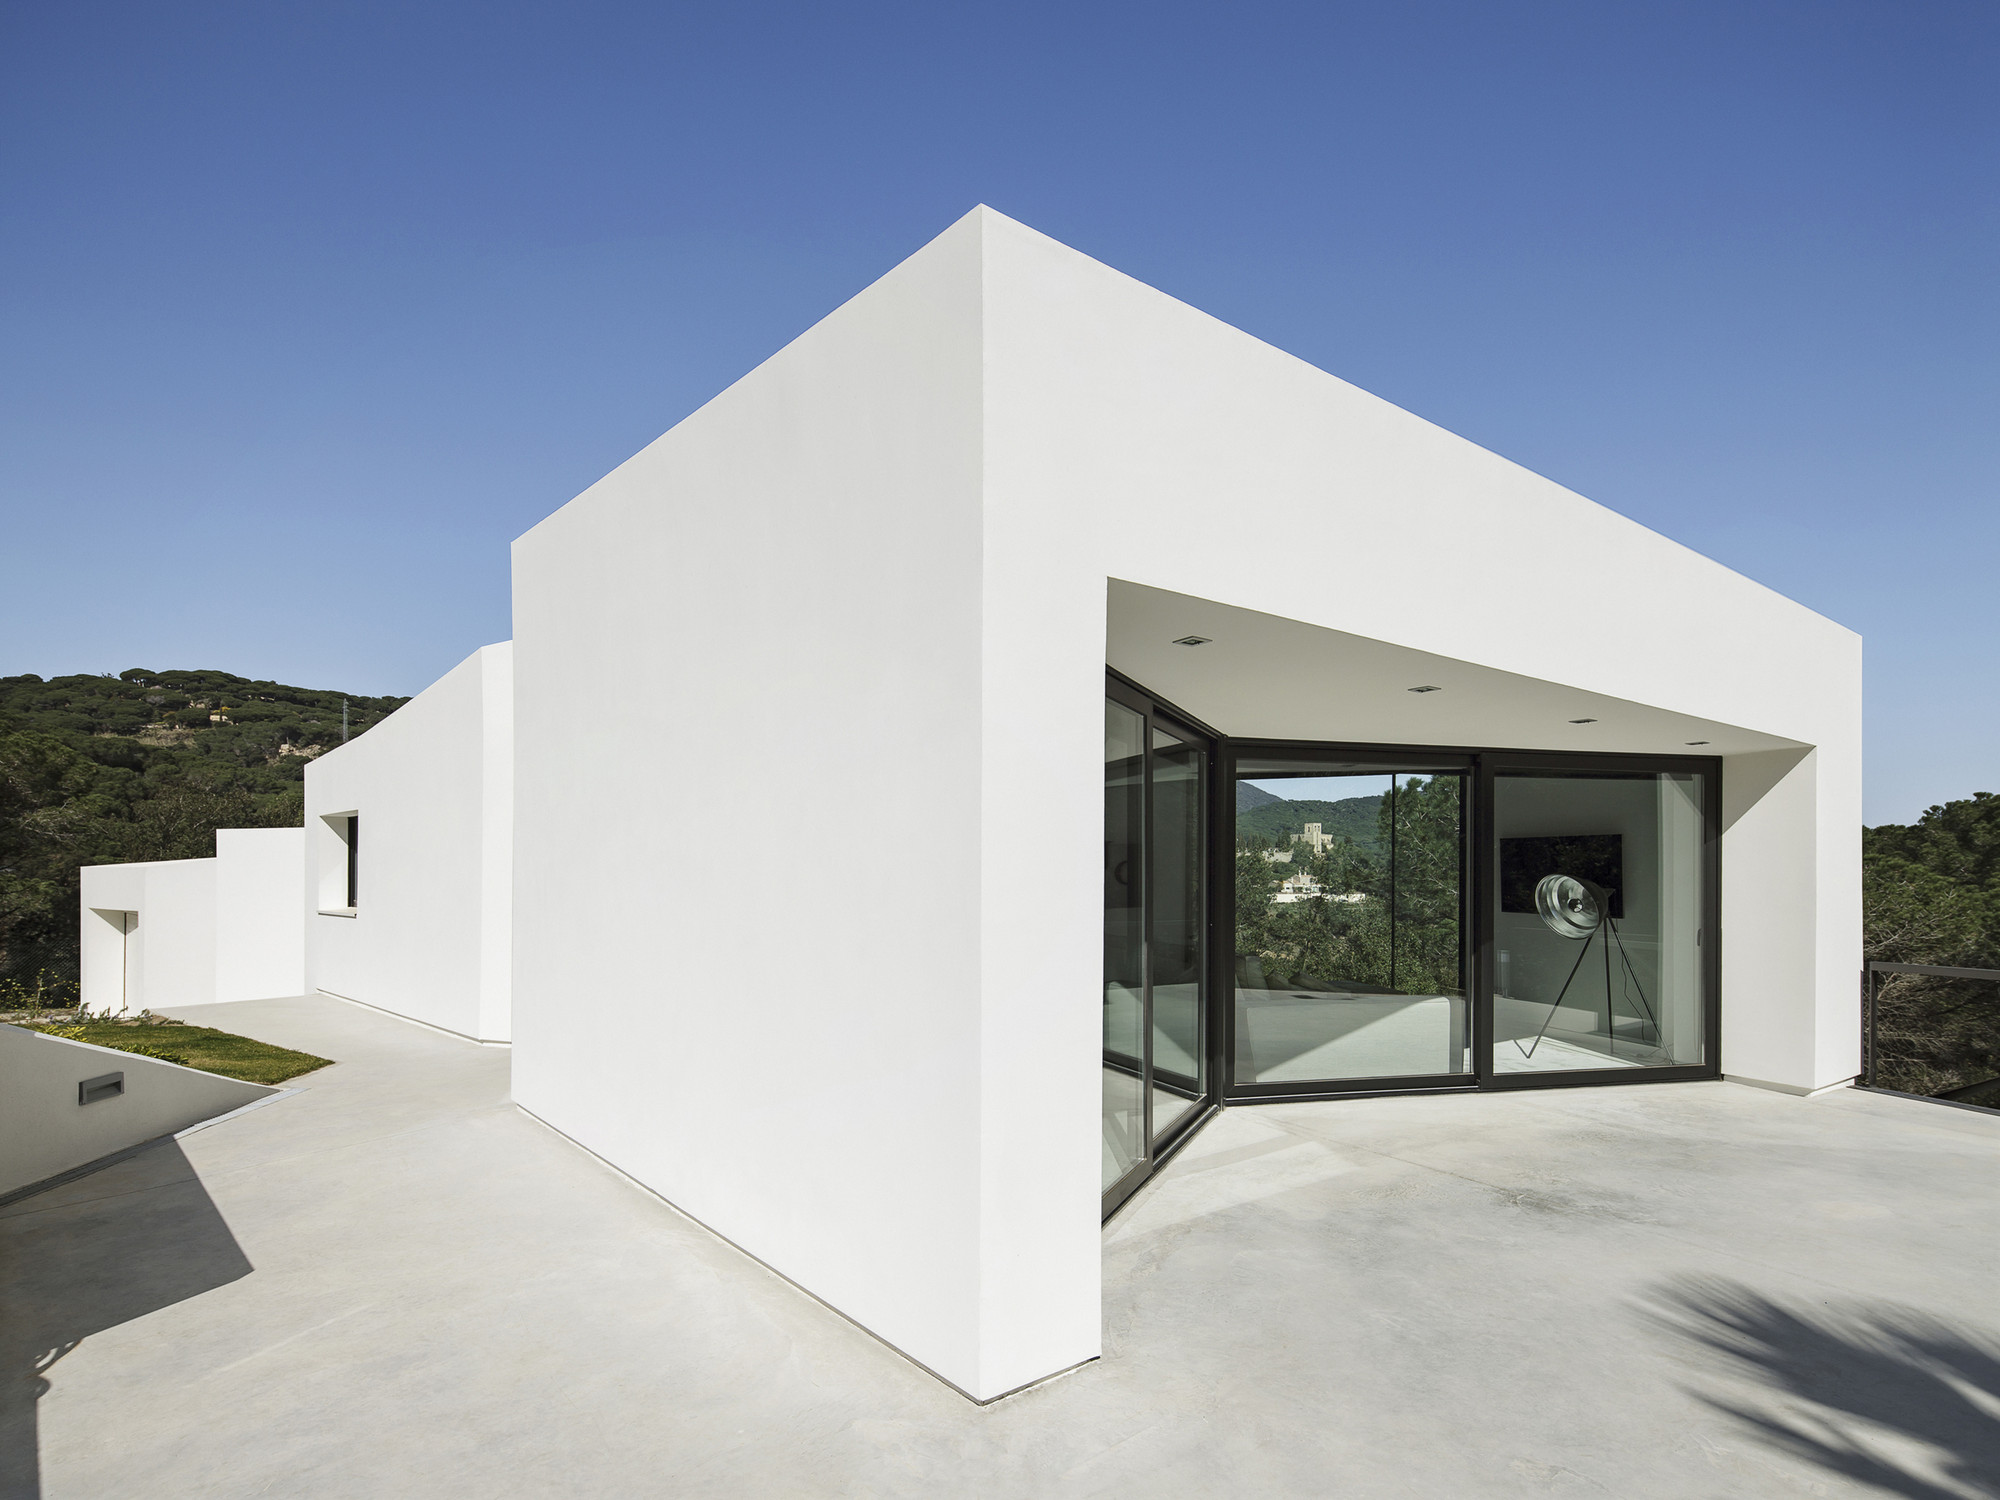 Vivienda en LLavaneres / MIRAG ArquitecturaiGestió